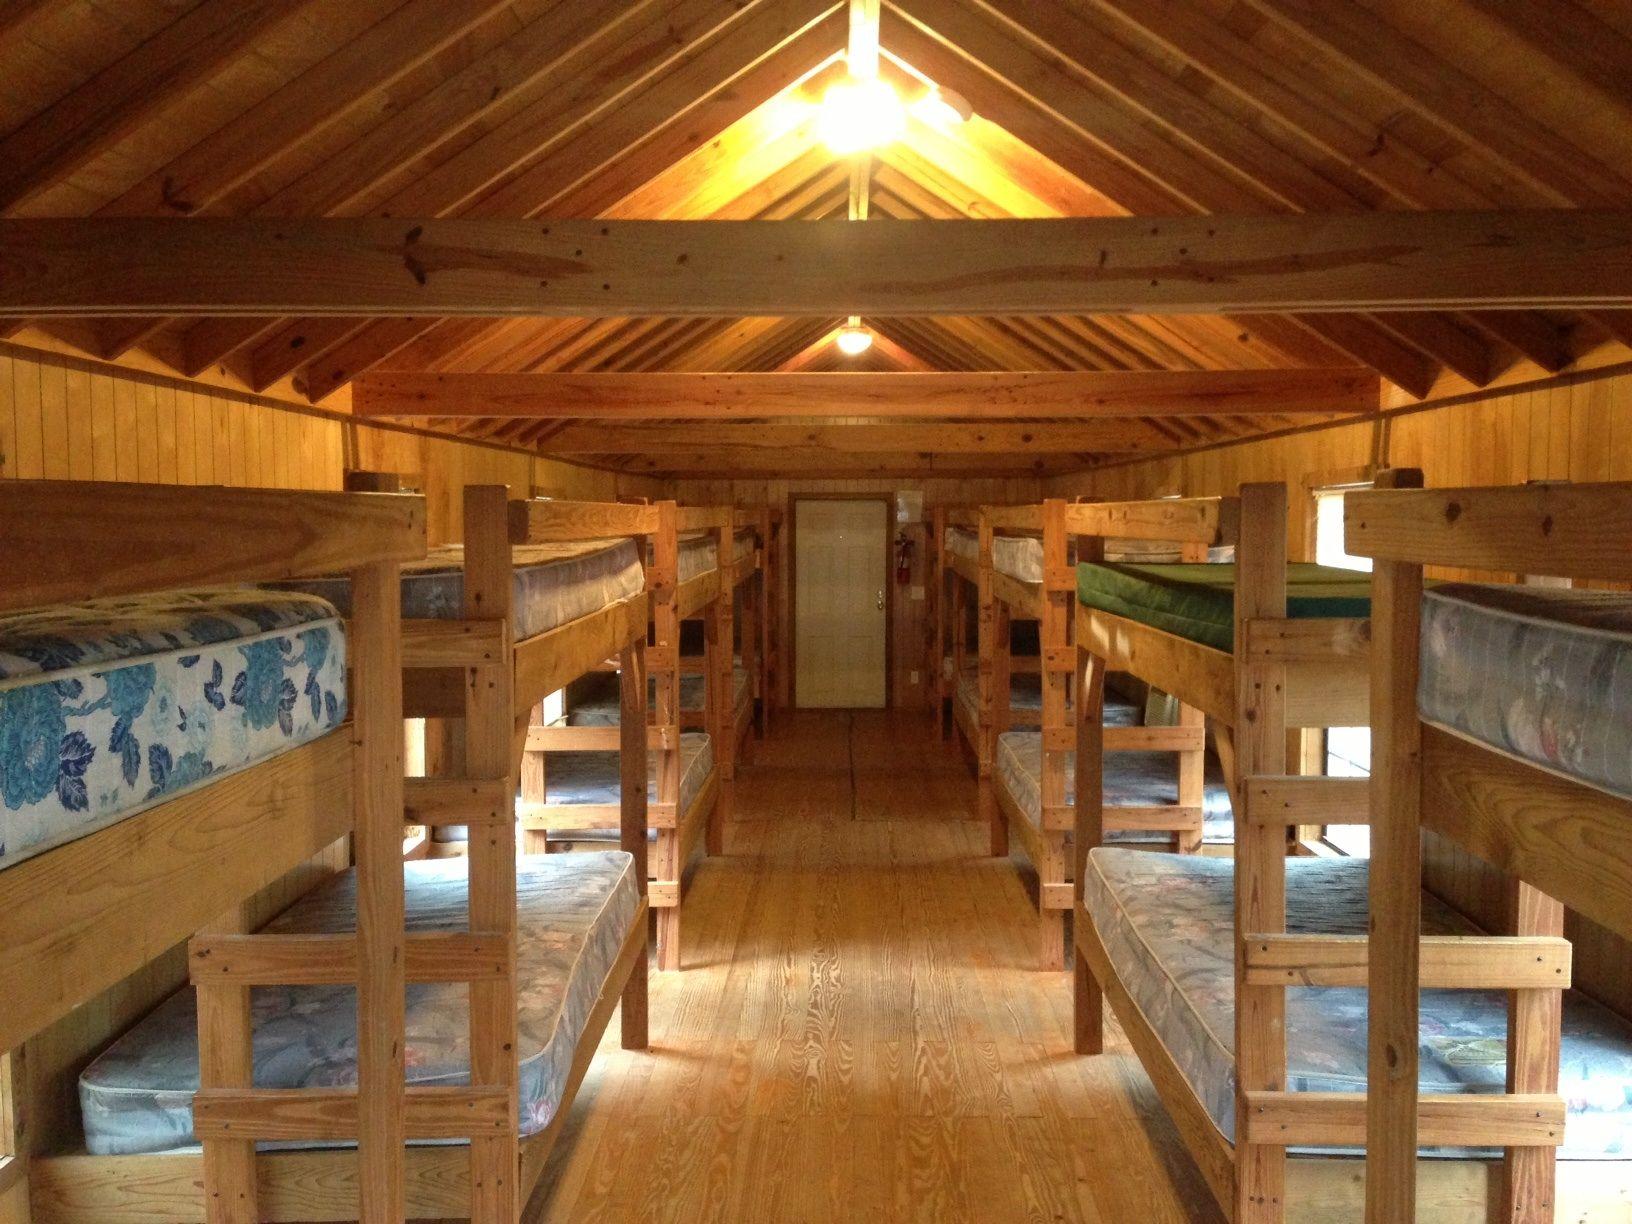 camp cabin kids - Google Search